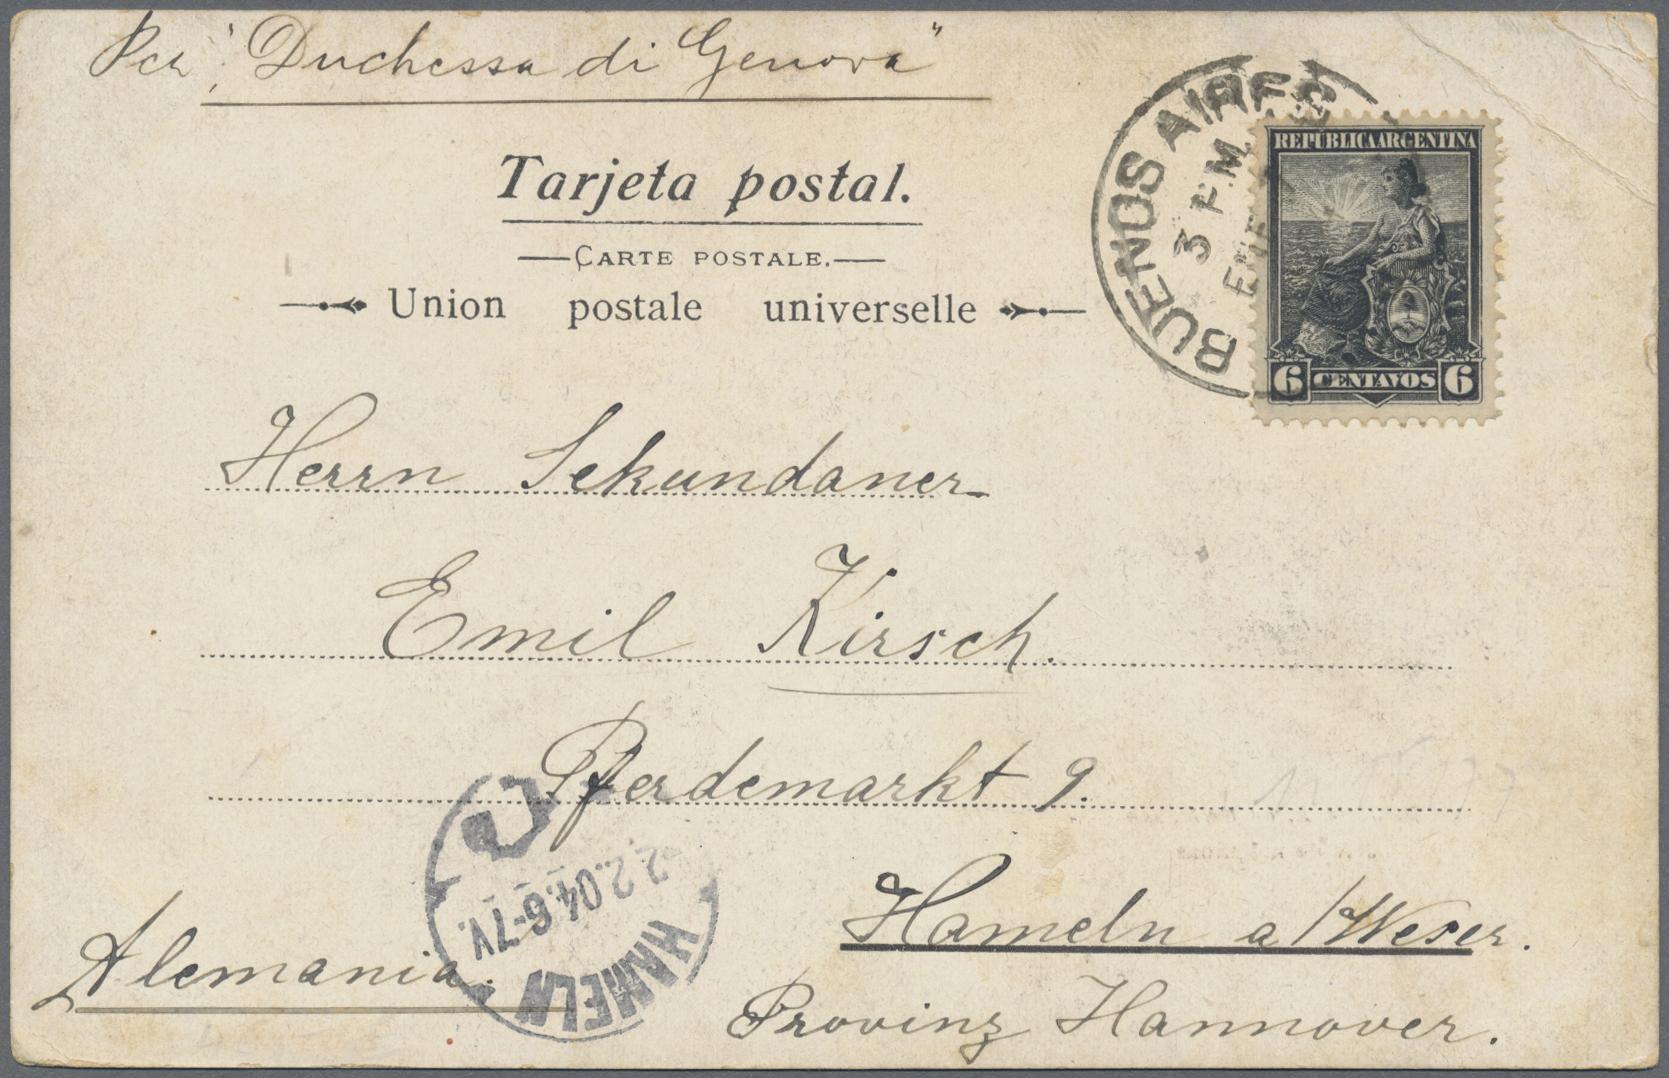 Lot 11015 - thematik: antarktis / antarctic  -  Auktionshaus Christoph Gärtner GmbH & Co. KG Single lots Philately Overseas & Europe. Auction #39 Day 4